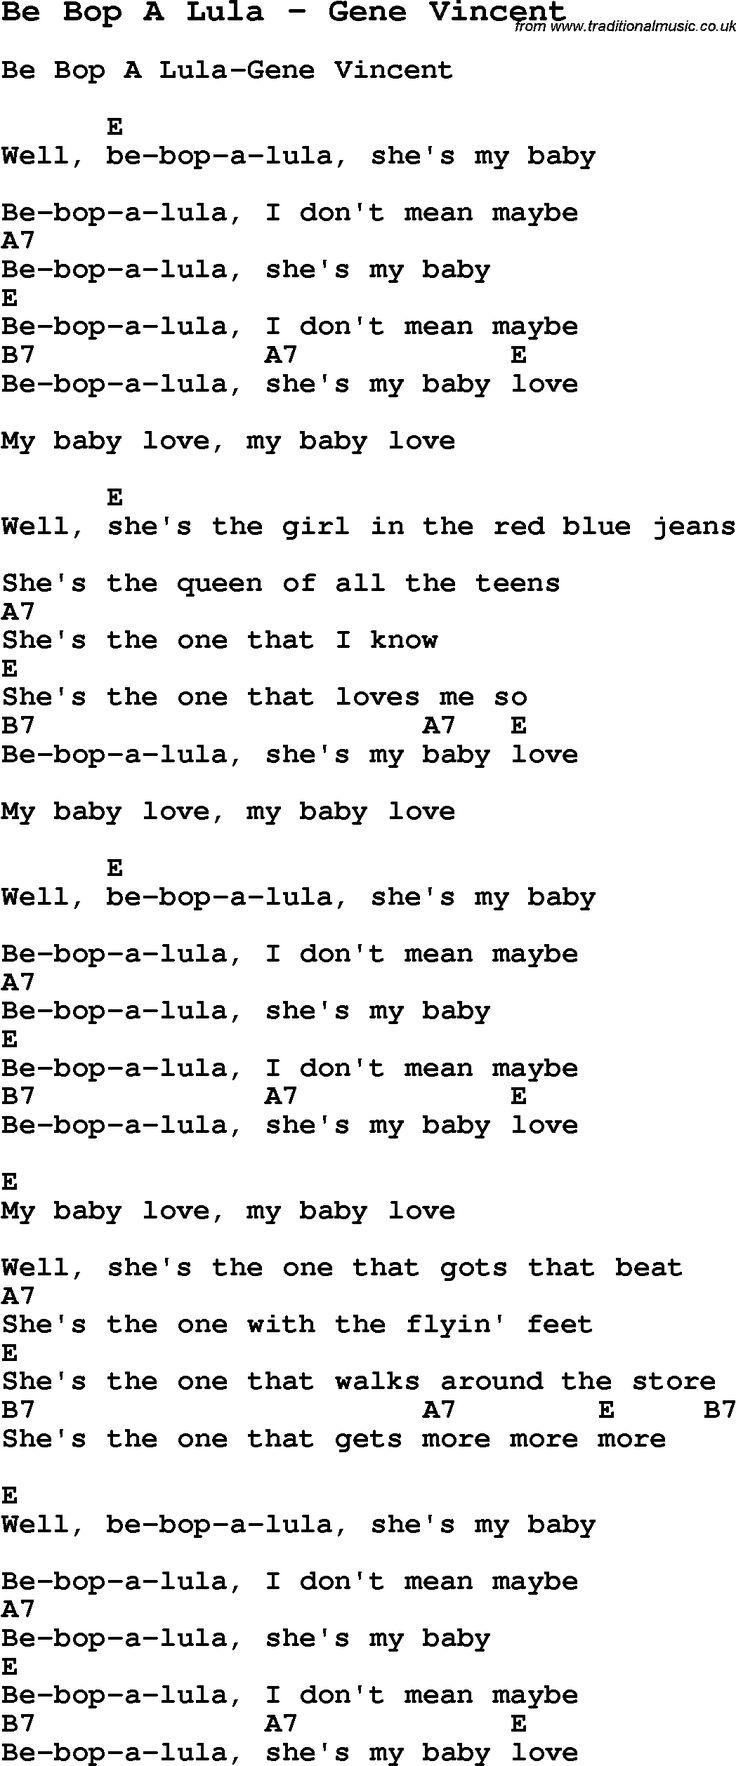 Lyrics to the song mr sandman